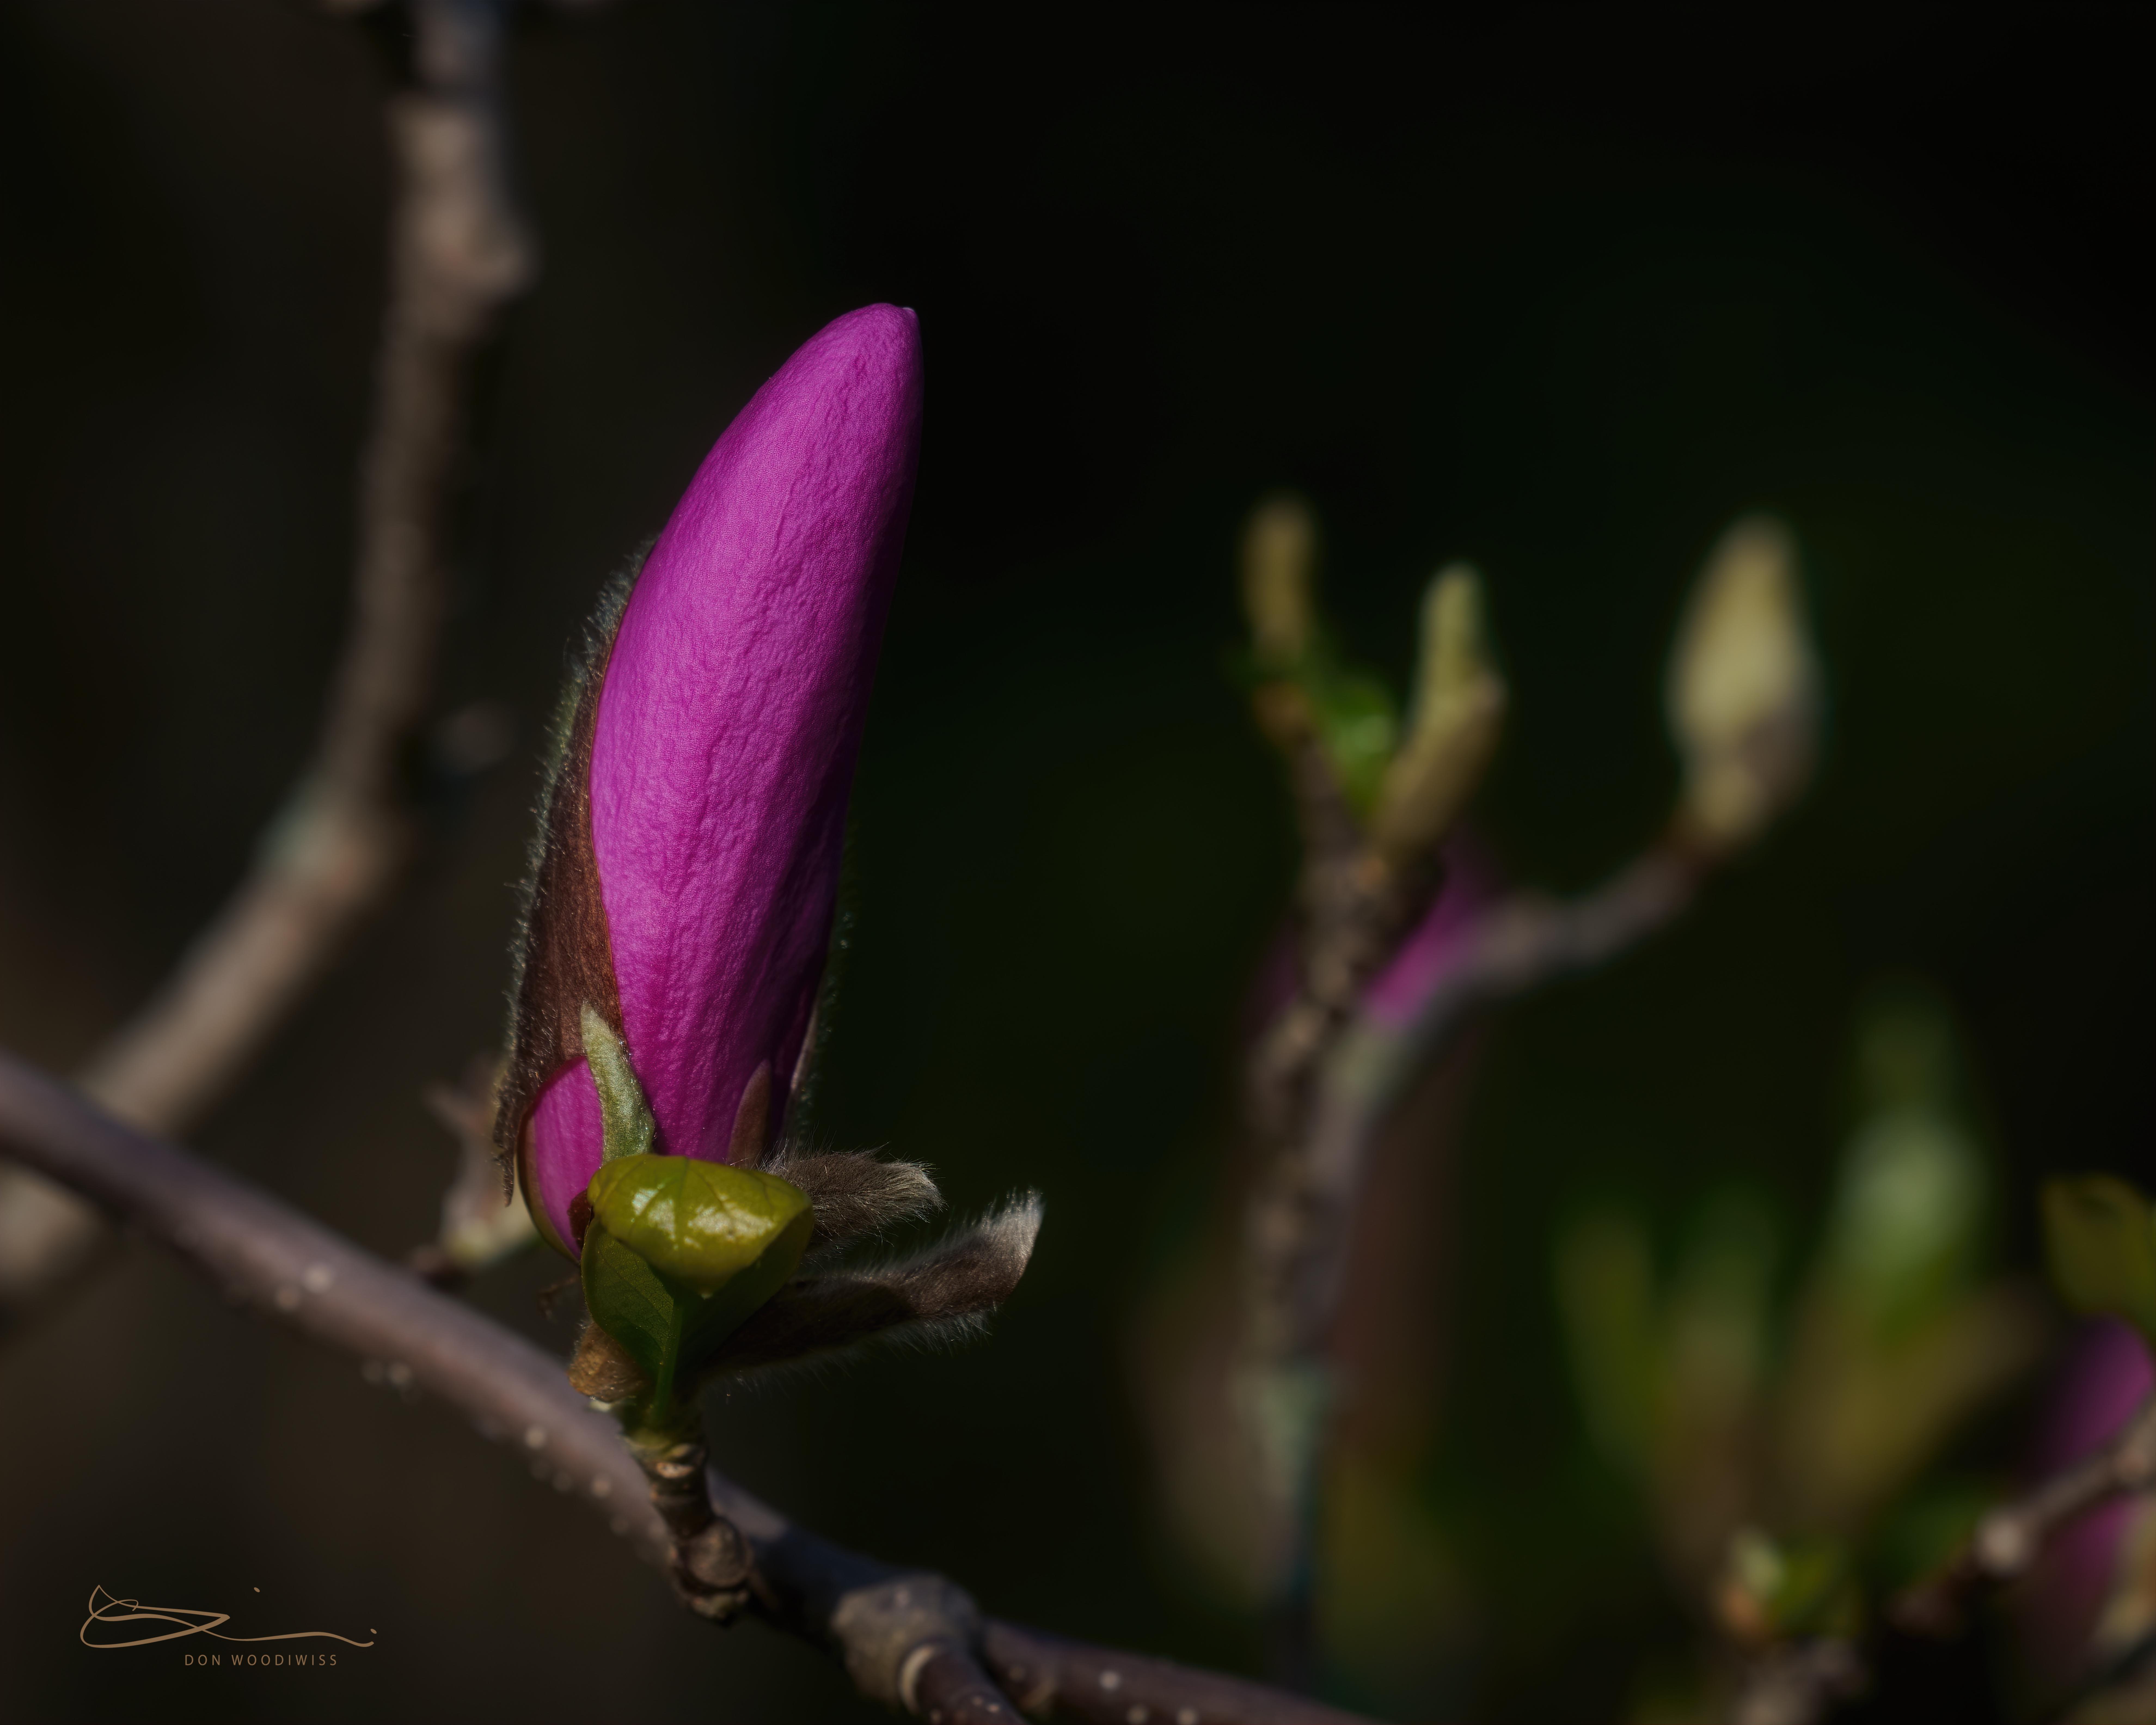 magnolia bud-Don Woodiwiss-Woodiwiss Photography